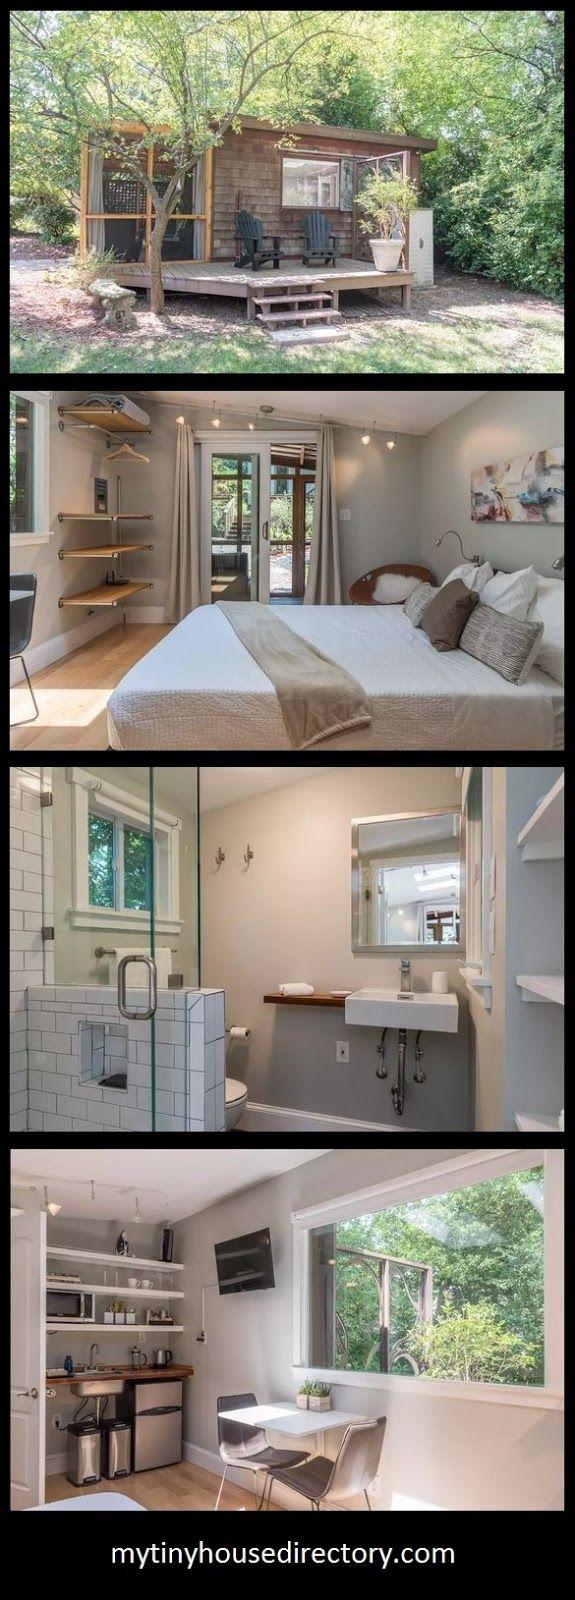 mytinyhousedirectory: Tiny Urban Cottage Vacation Rental